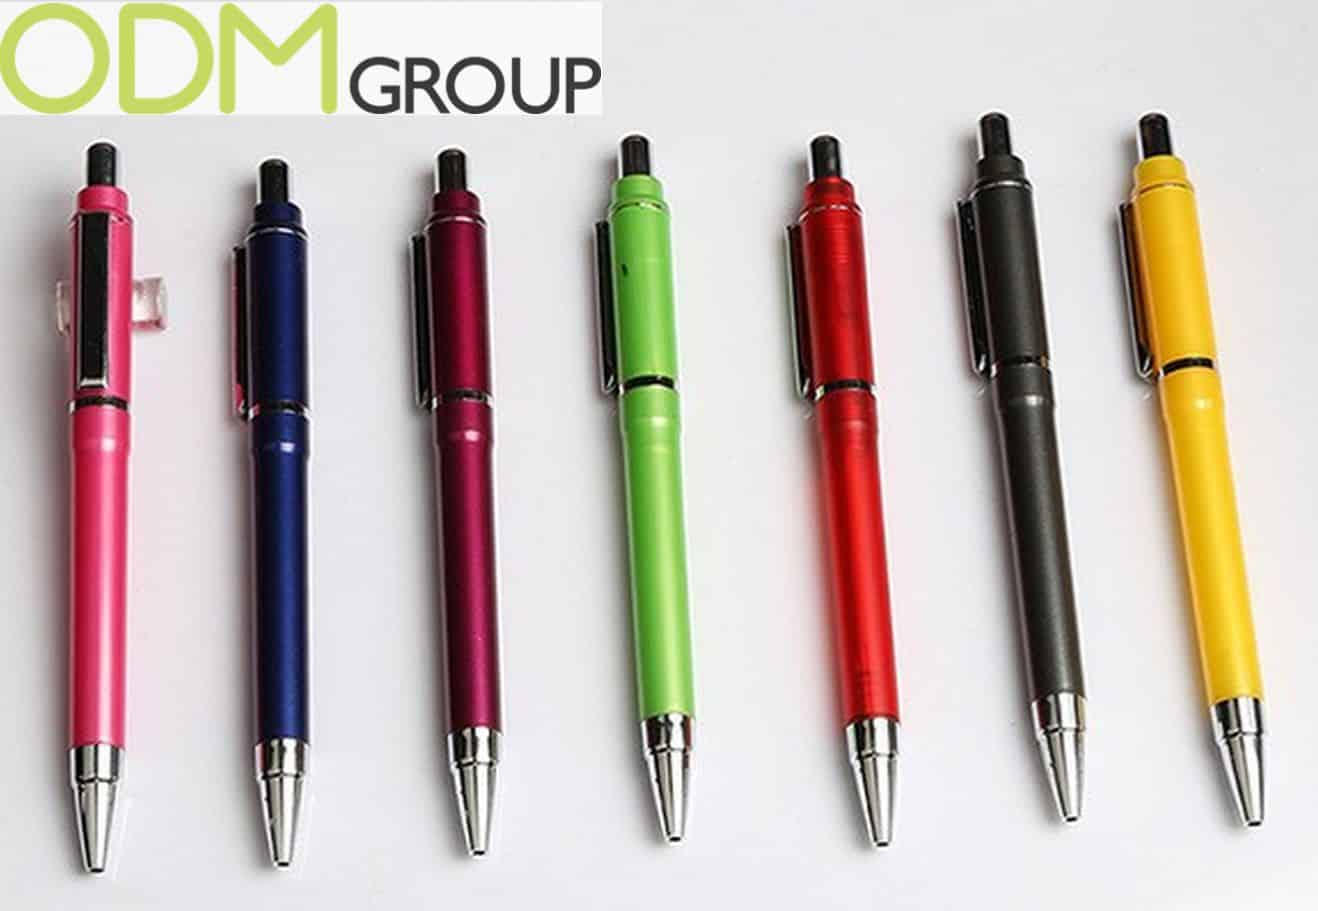 Storing Pens